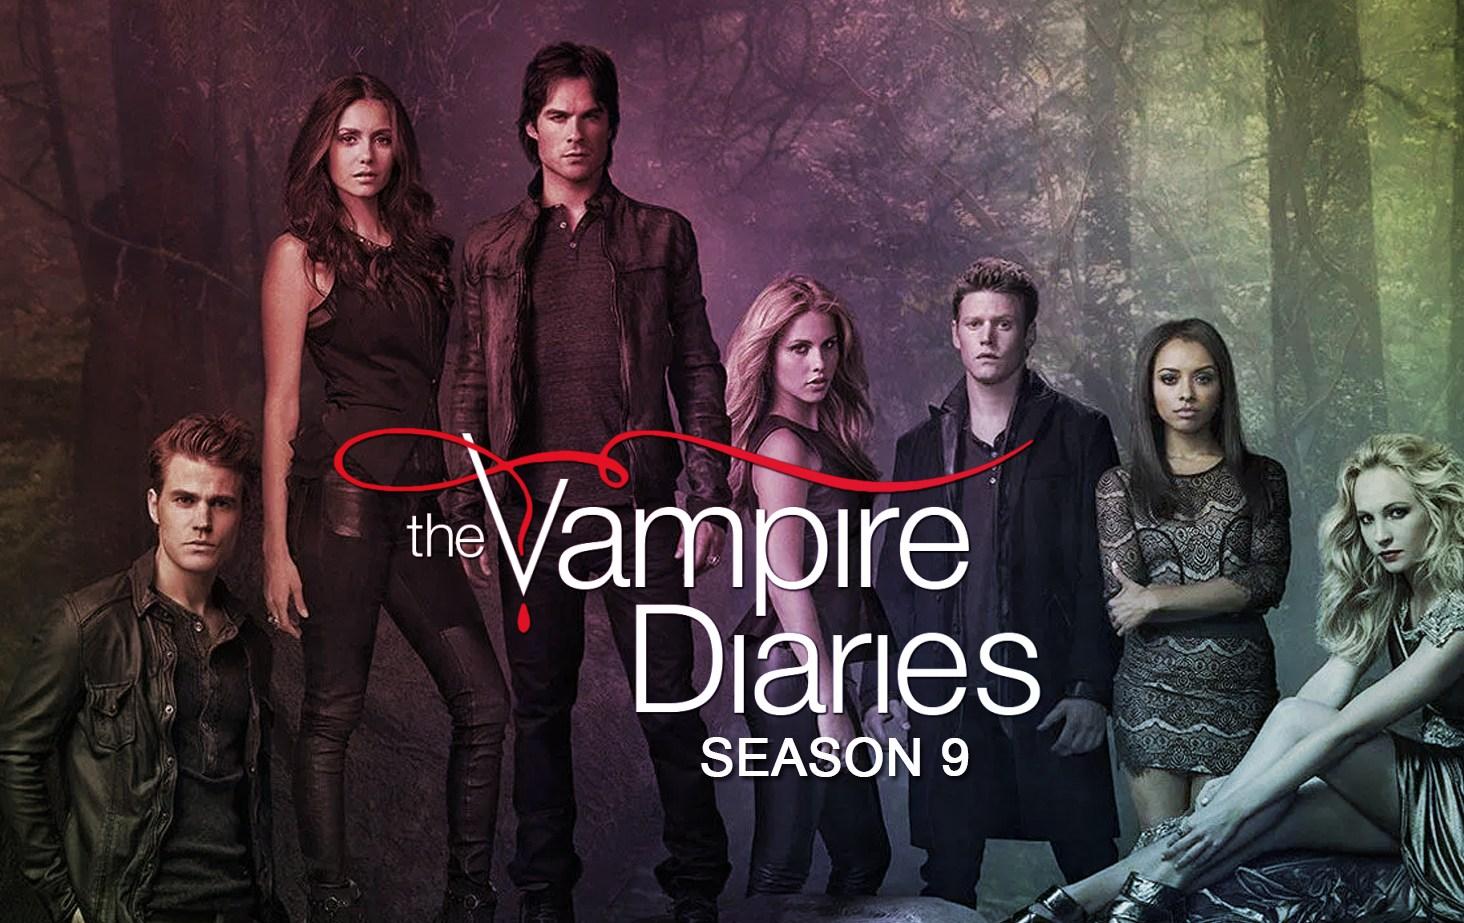 The Vampire Diaries Season 9 Release Date